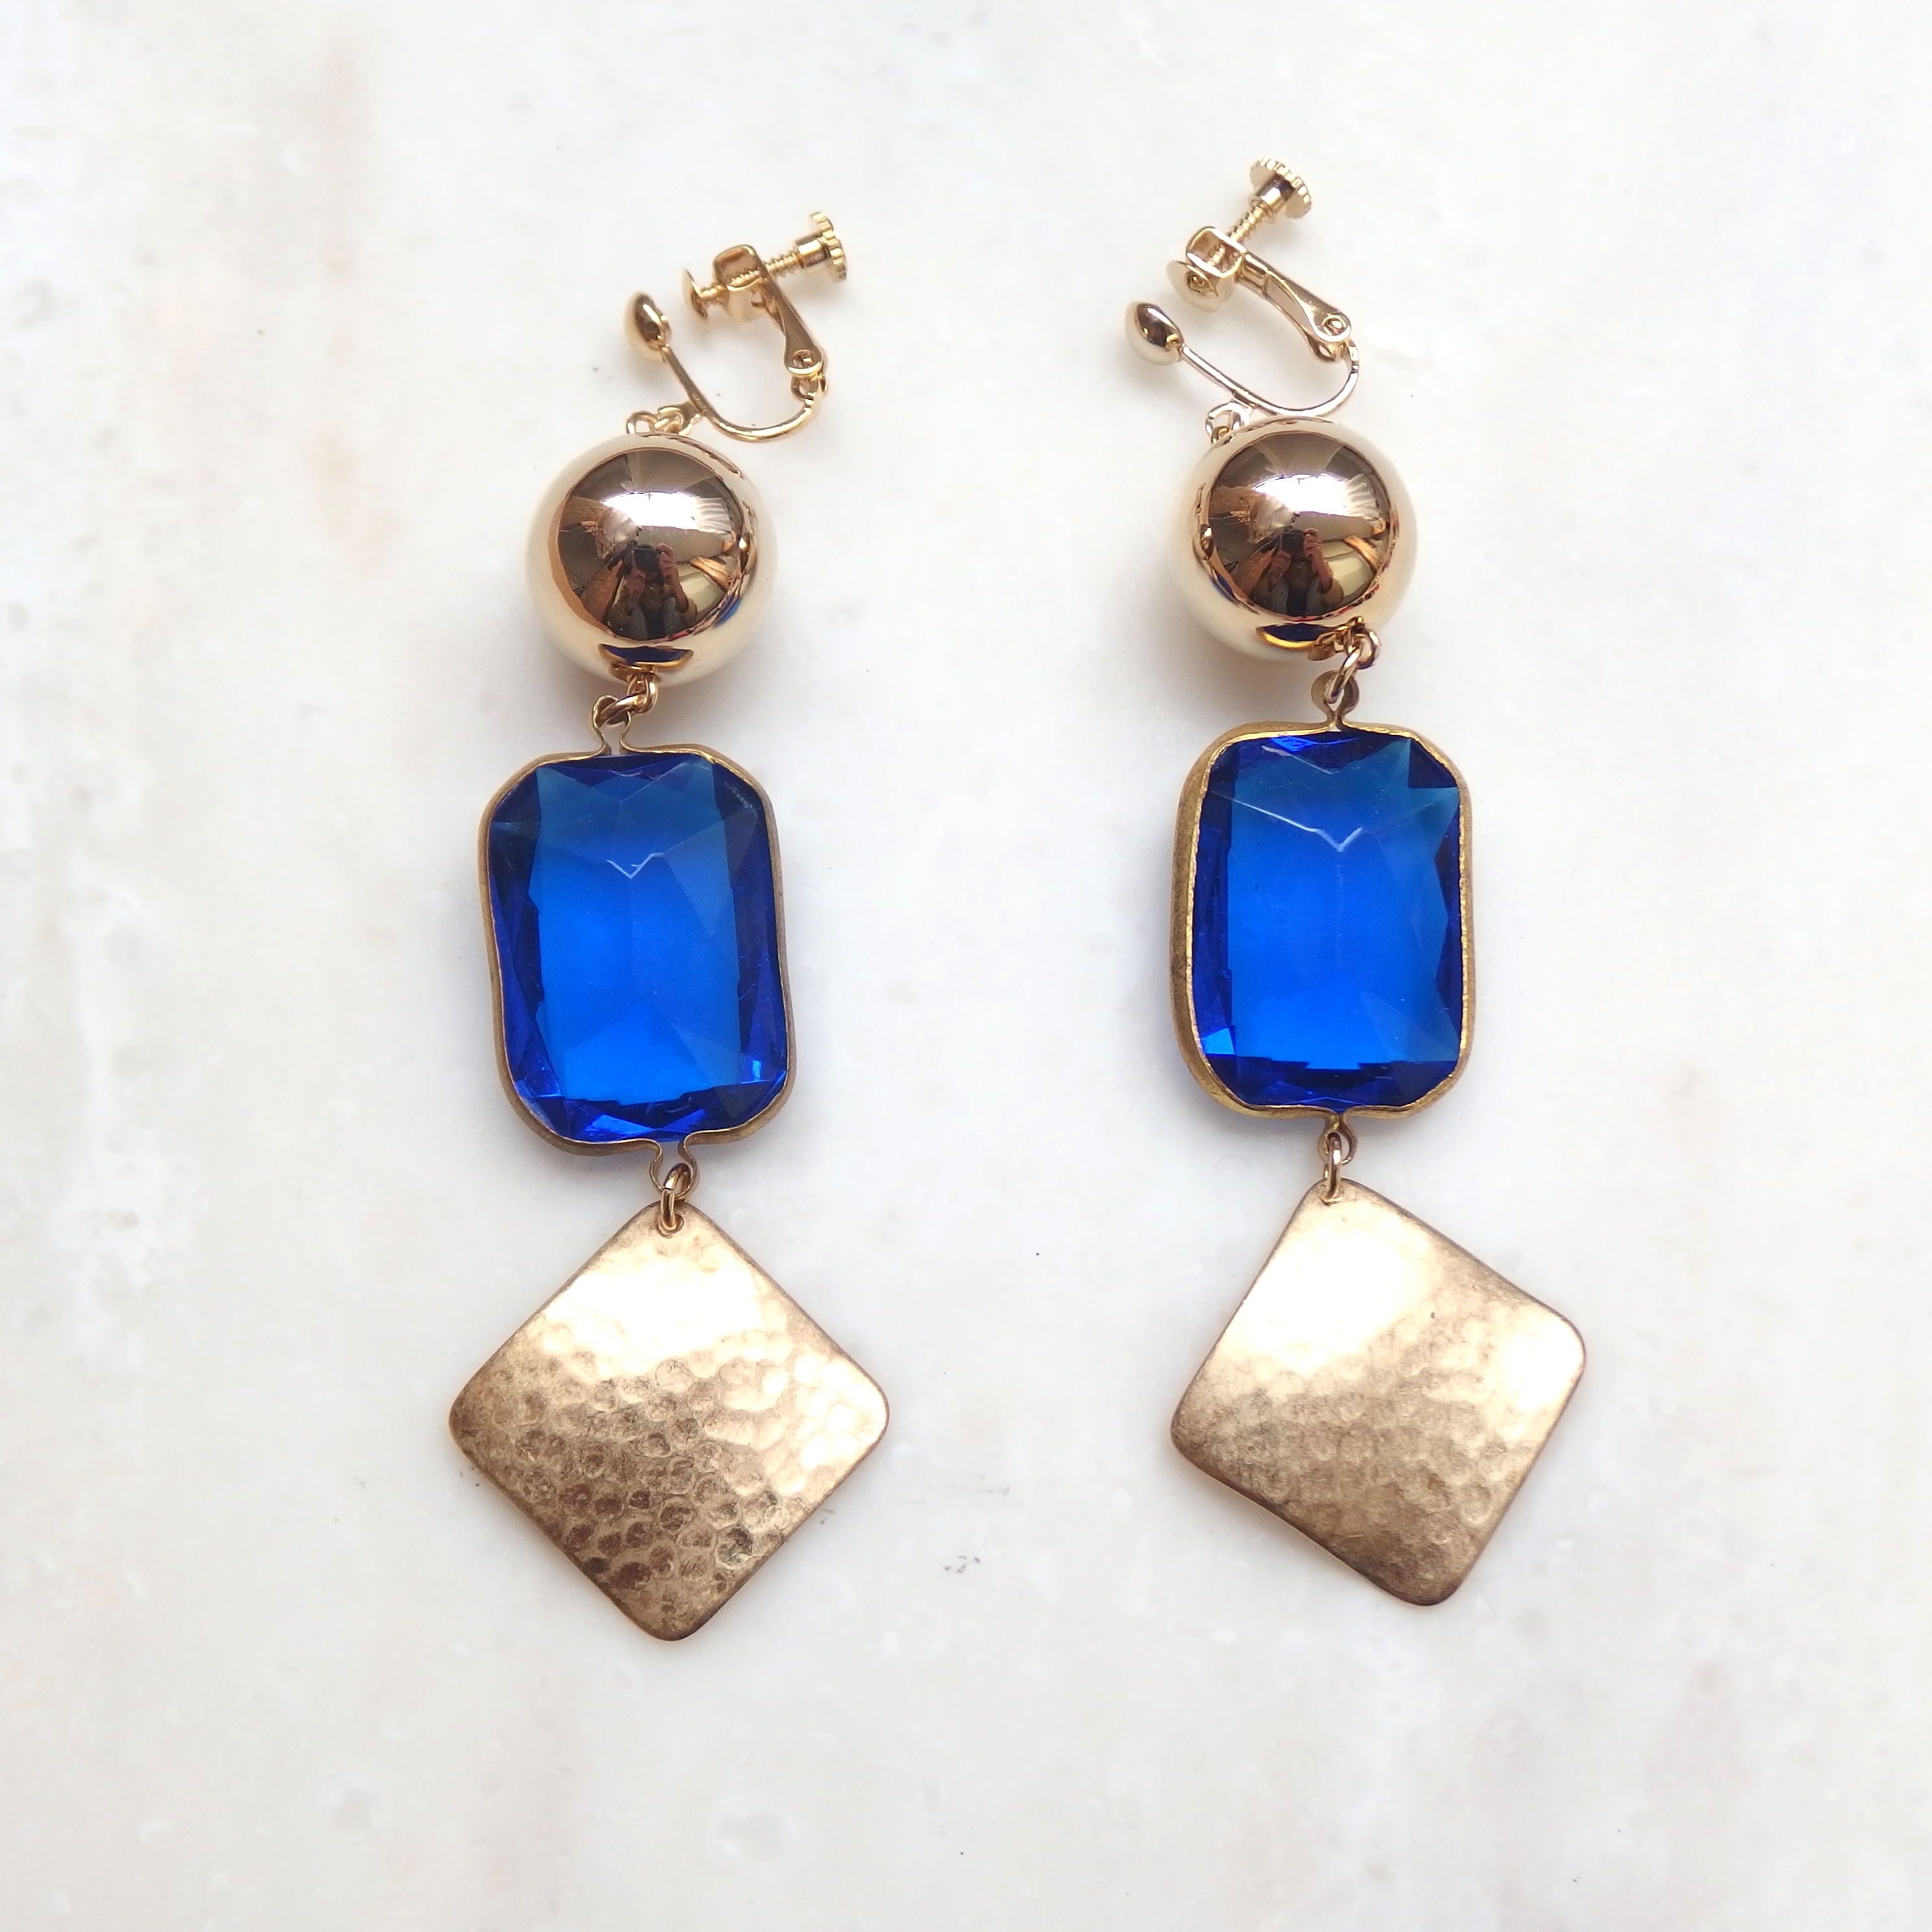 Blue Jewel Earring (ピアス/チタンピアス変更可能)